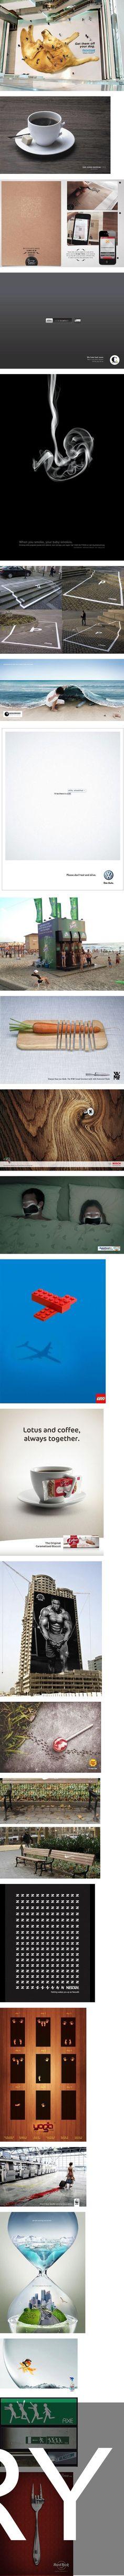 Some super creative ads!